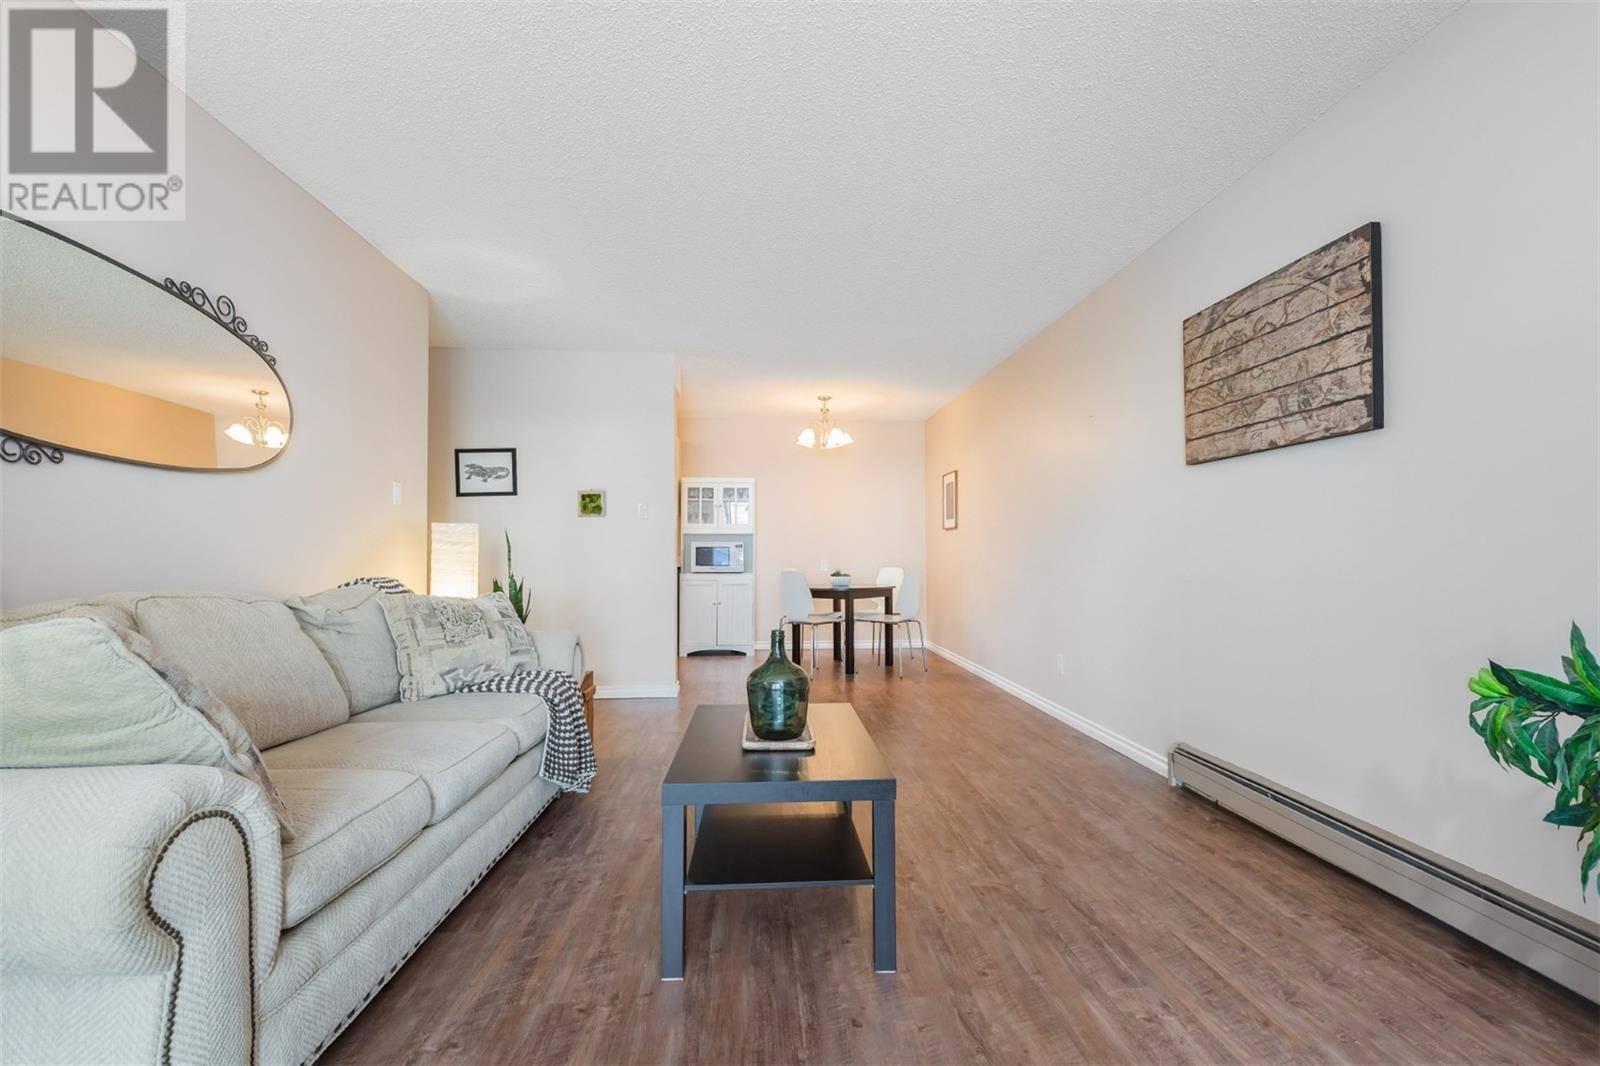 Condo for sale at 425 115th St E Unit 1516 Saskatoon Saskatchewan - MLS: SK786971